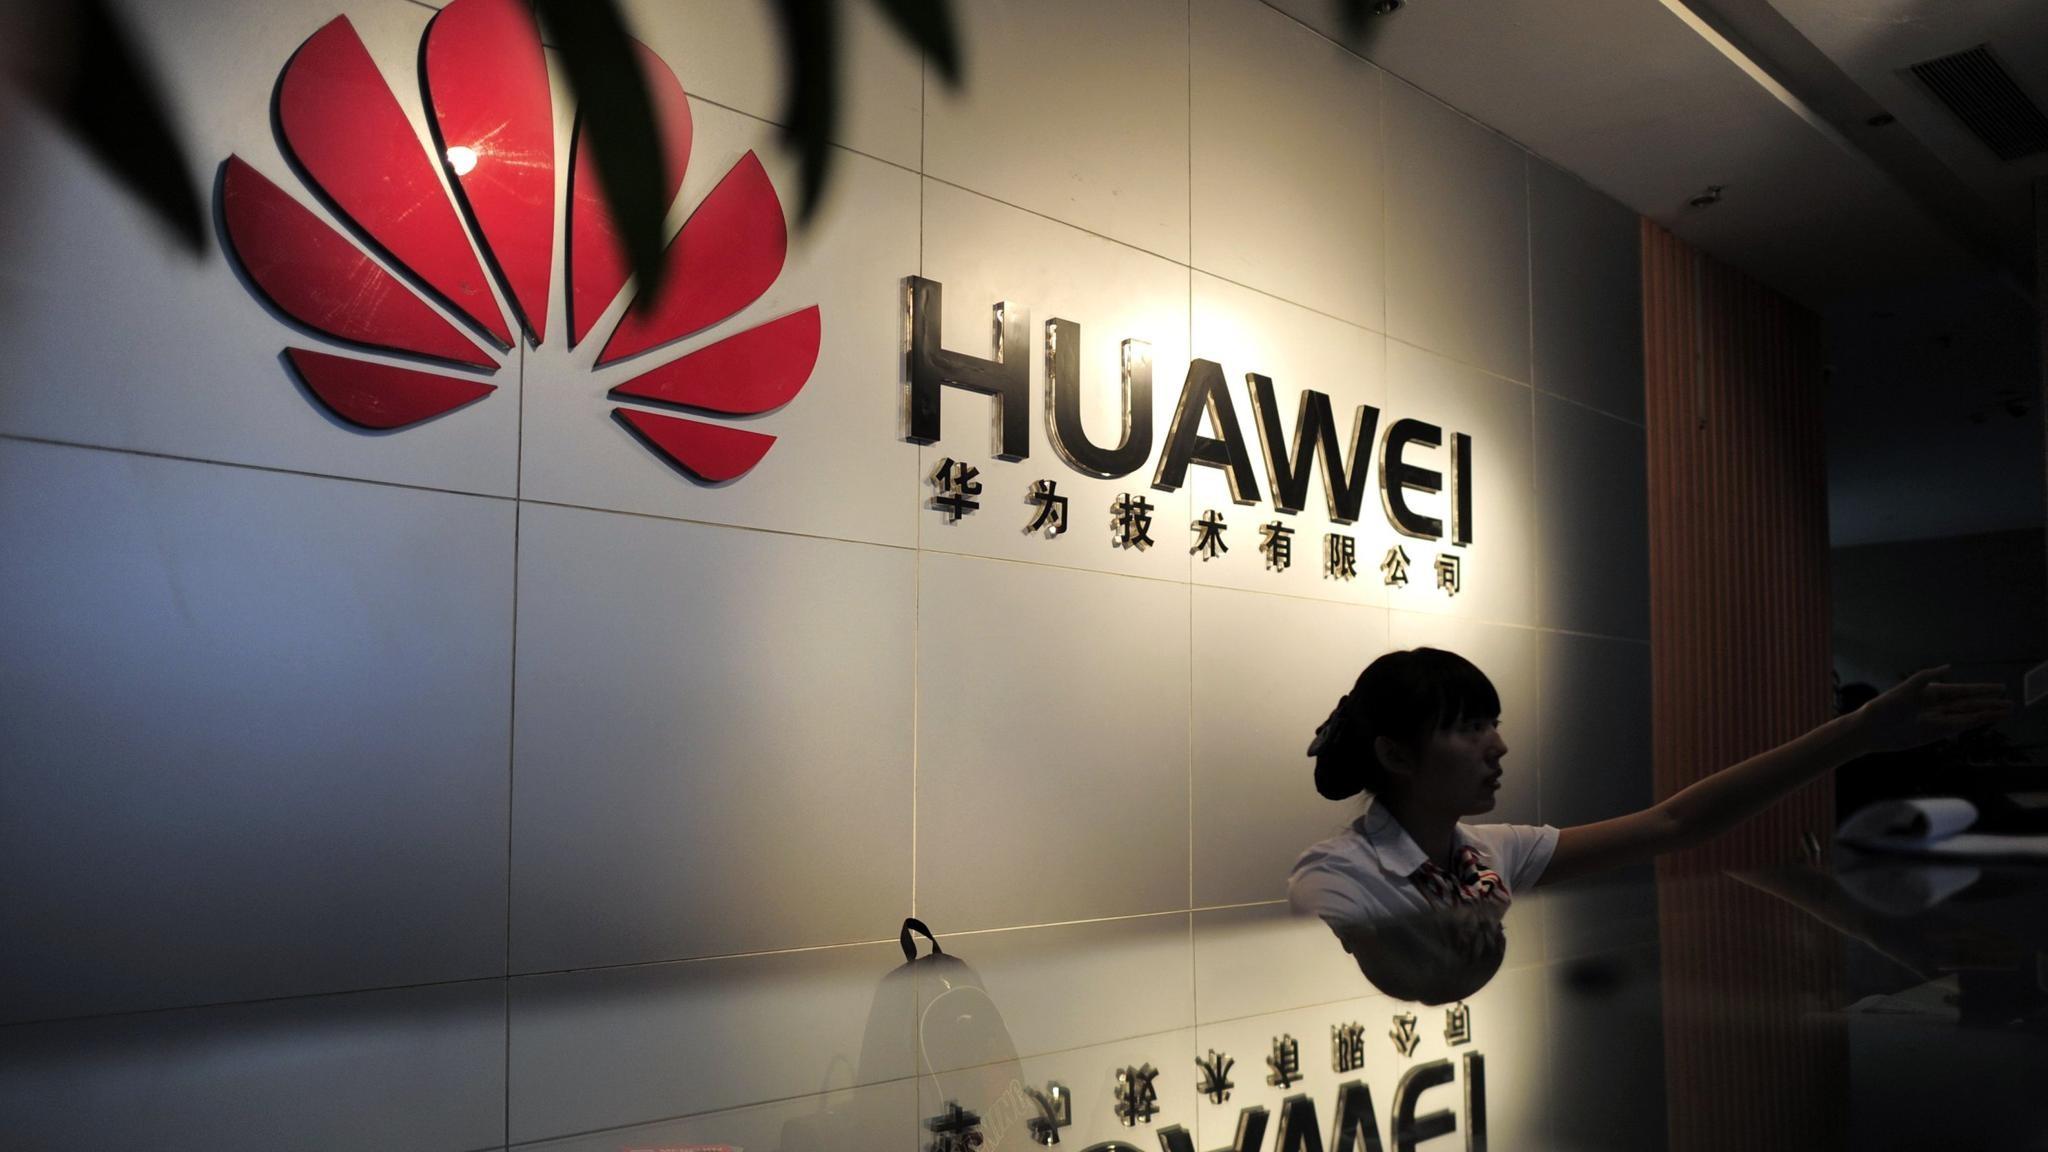 Офис корпорации Huawei